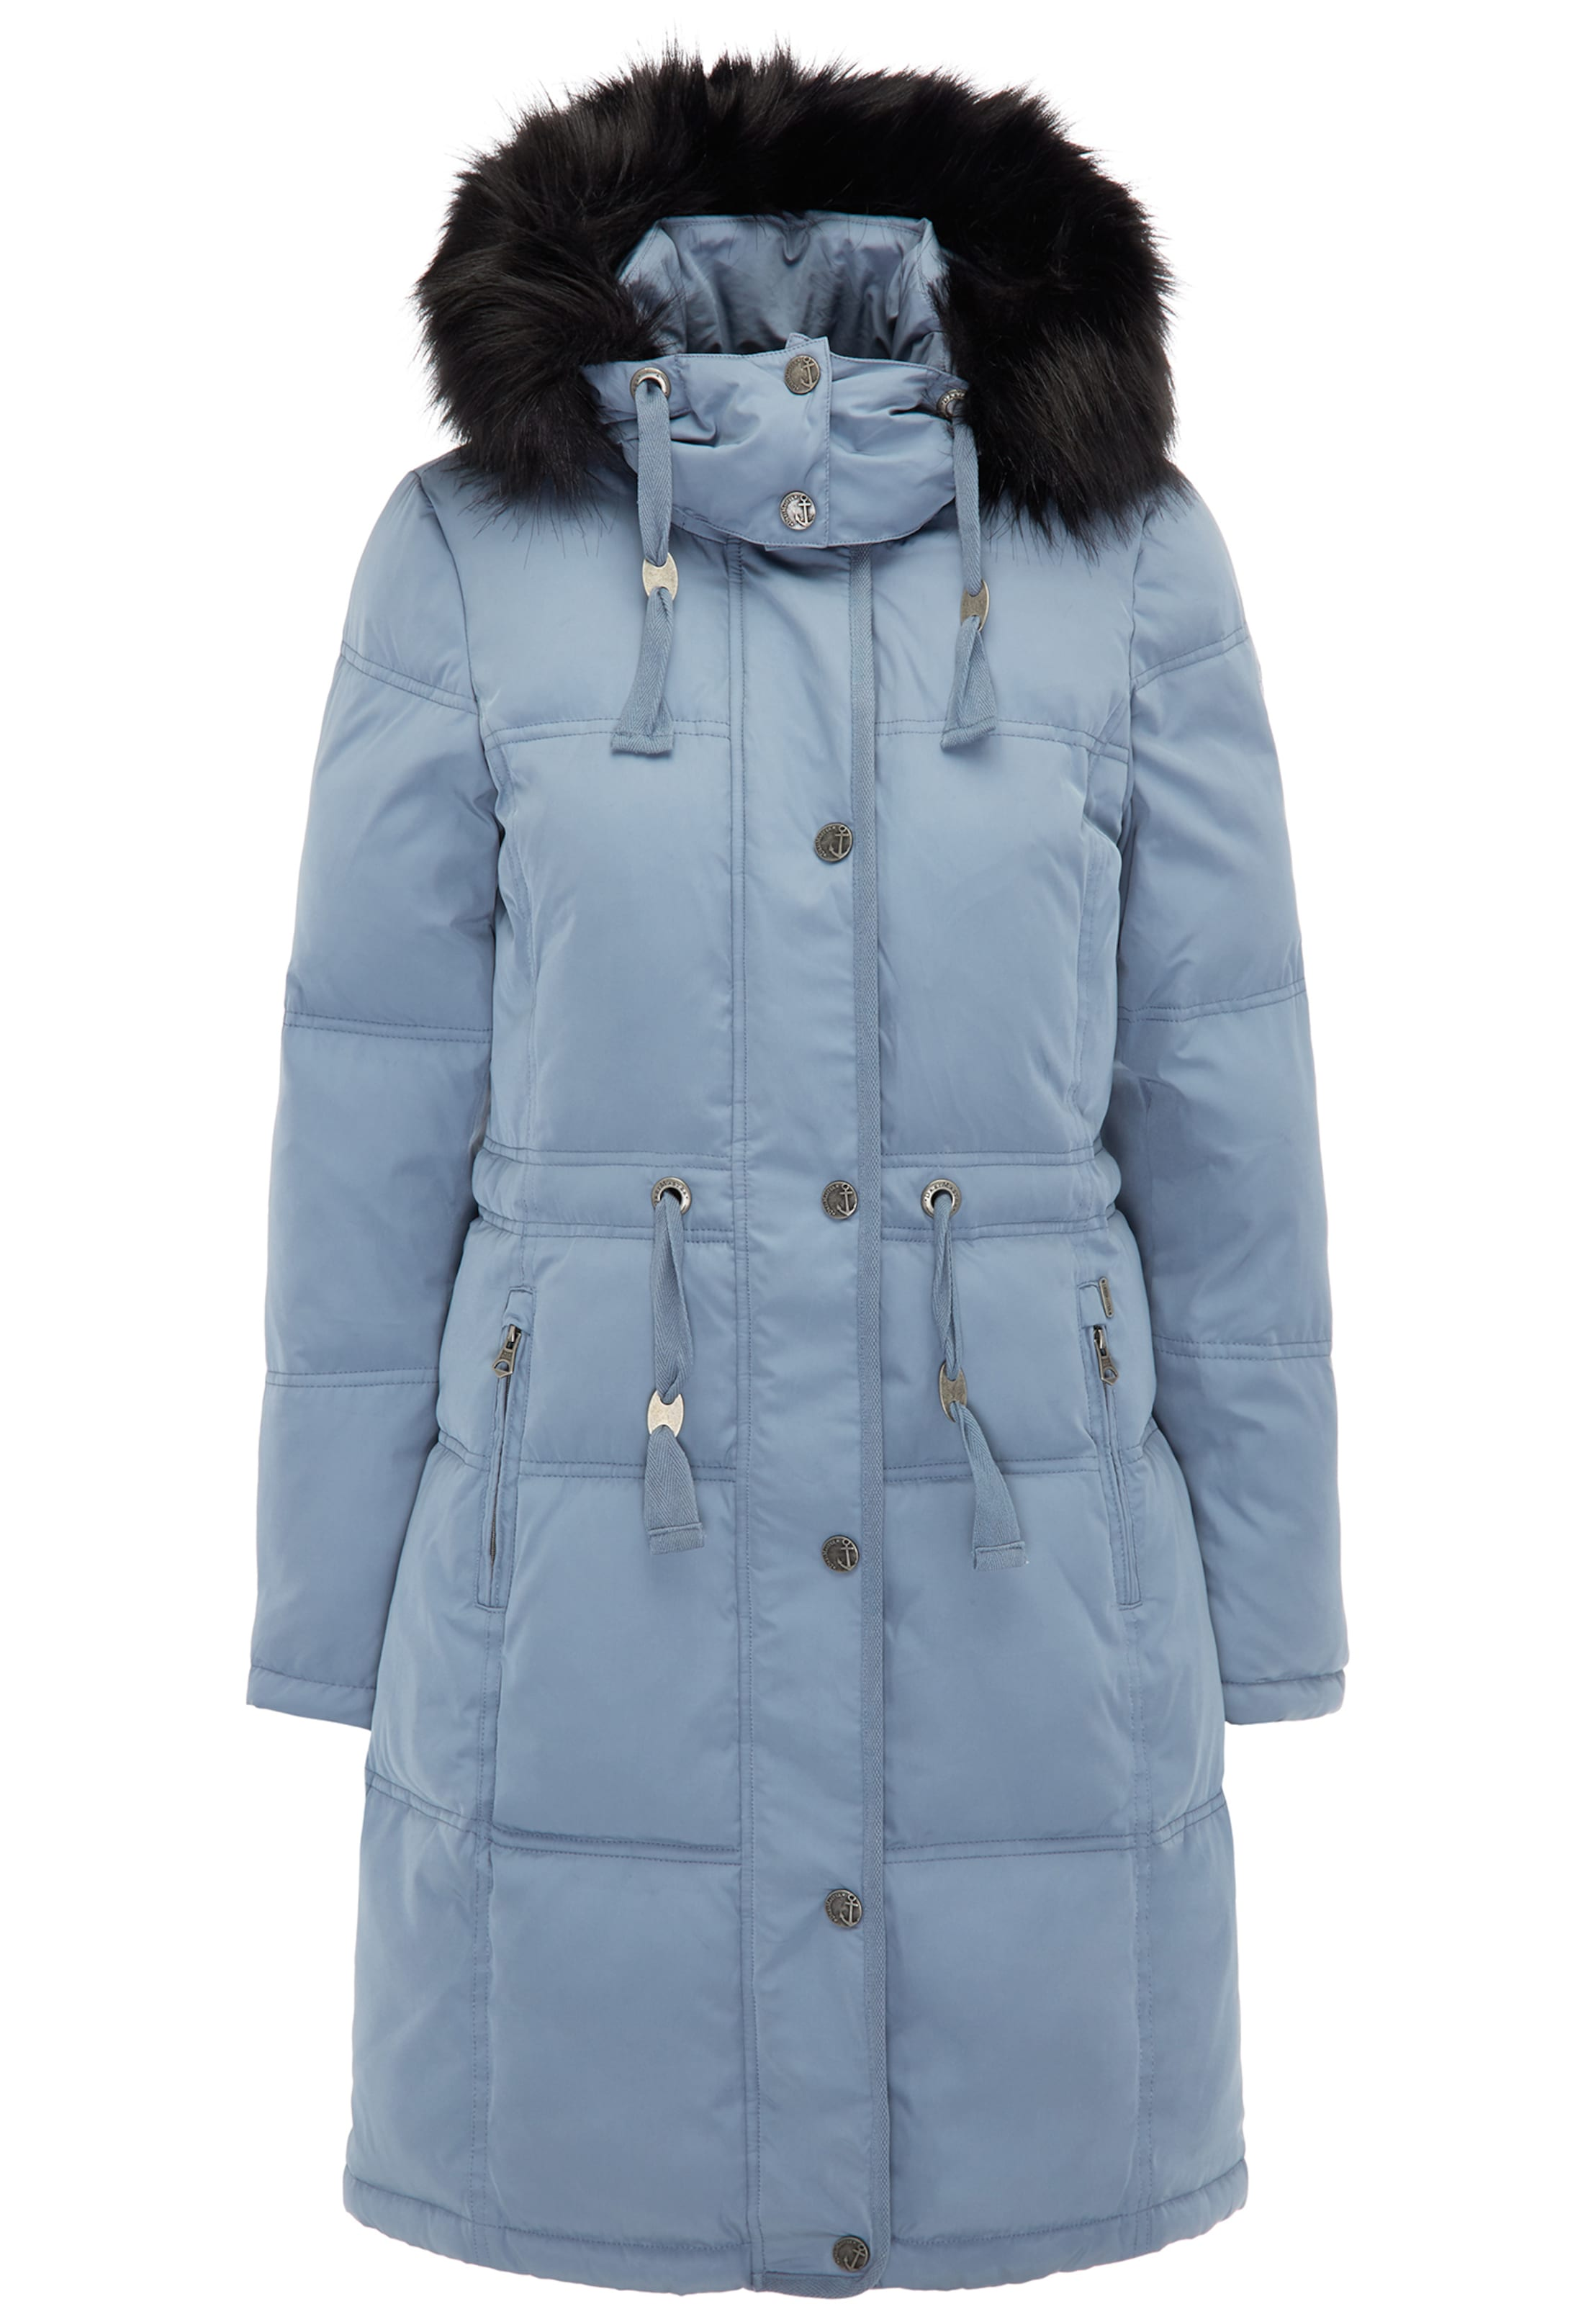 D'hiver In DreimasterManteau Clair In Bleu DreimasterManteau D'hiver Bleu b6fg7y